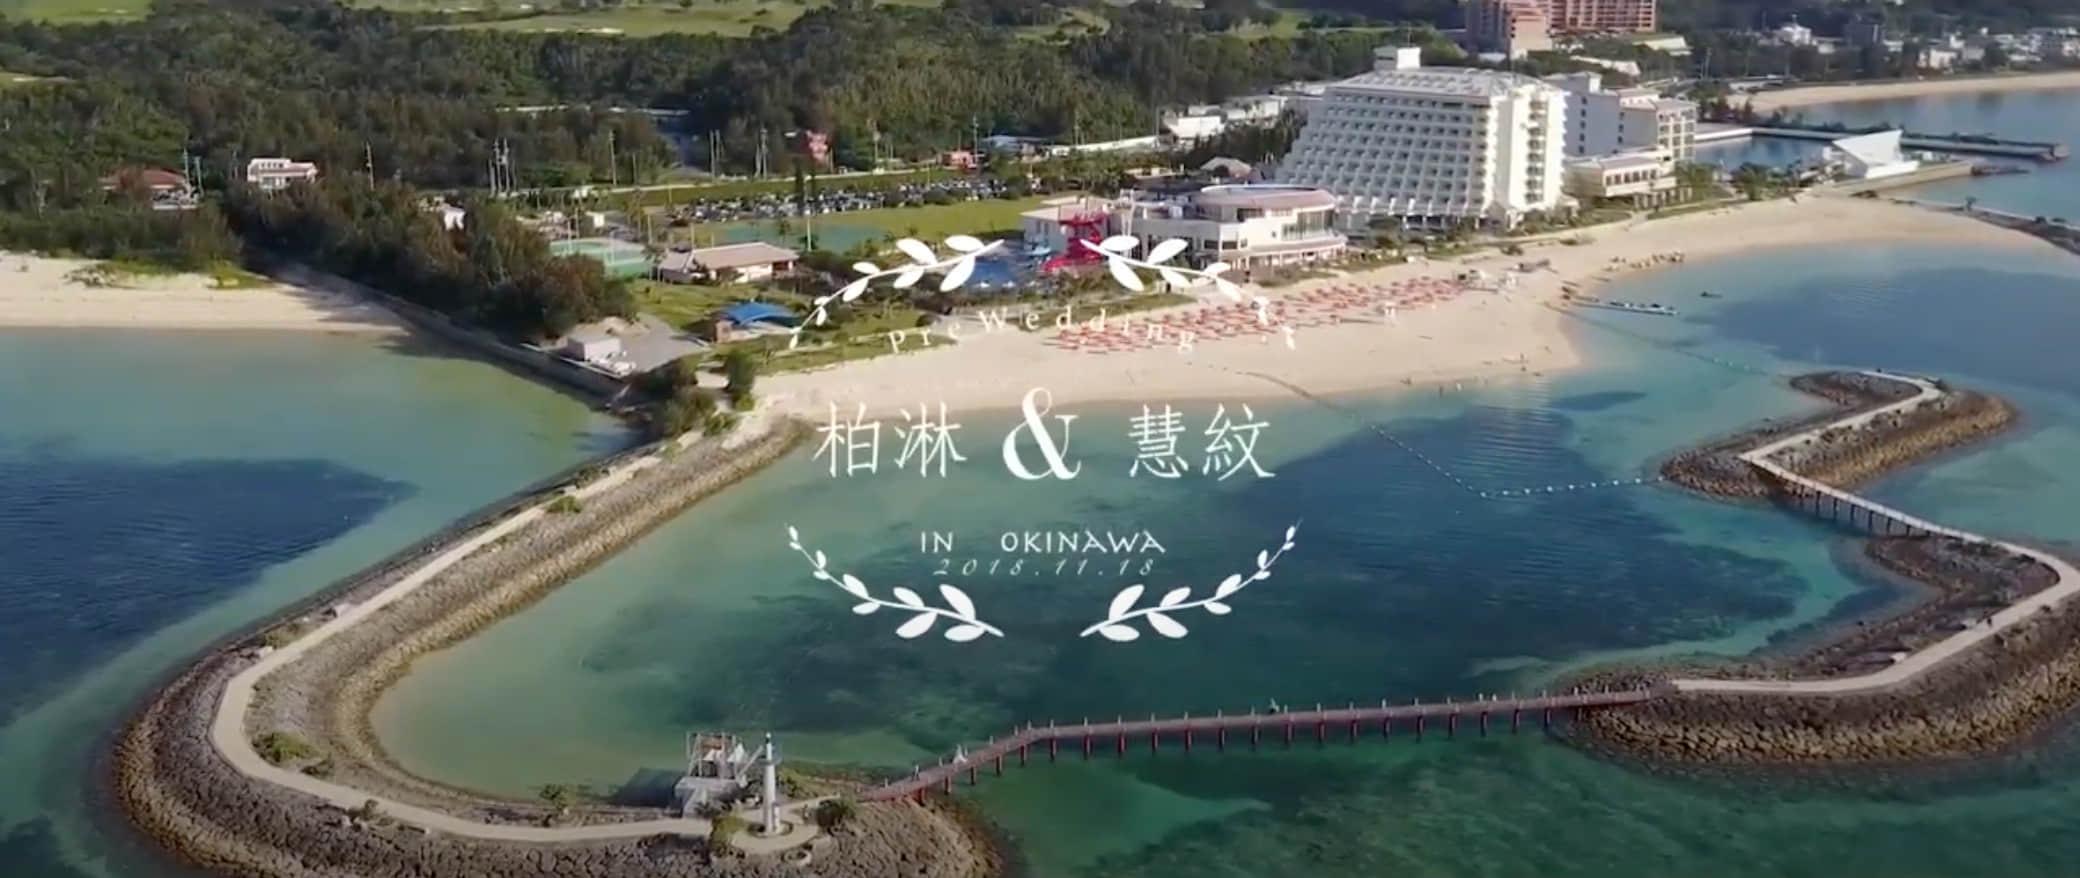 DCWEDDING 2018沖繩婚紗